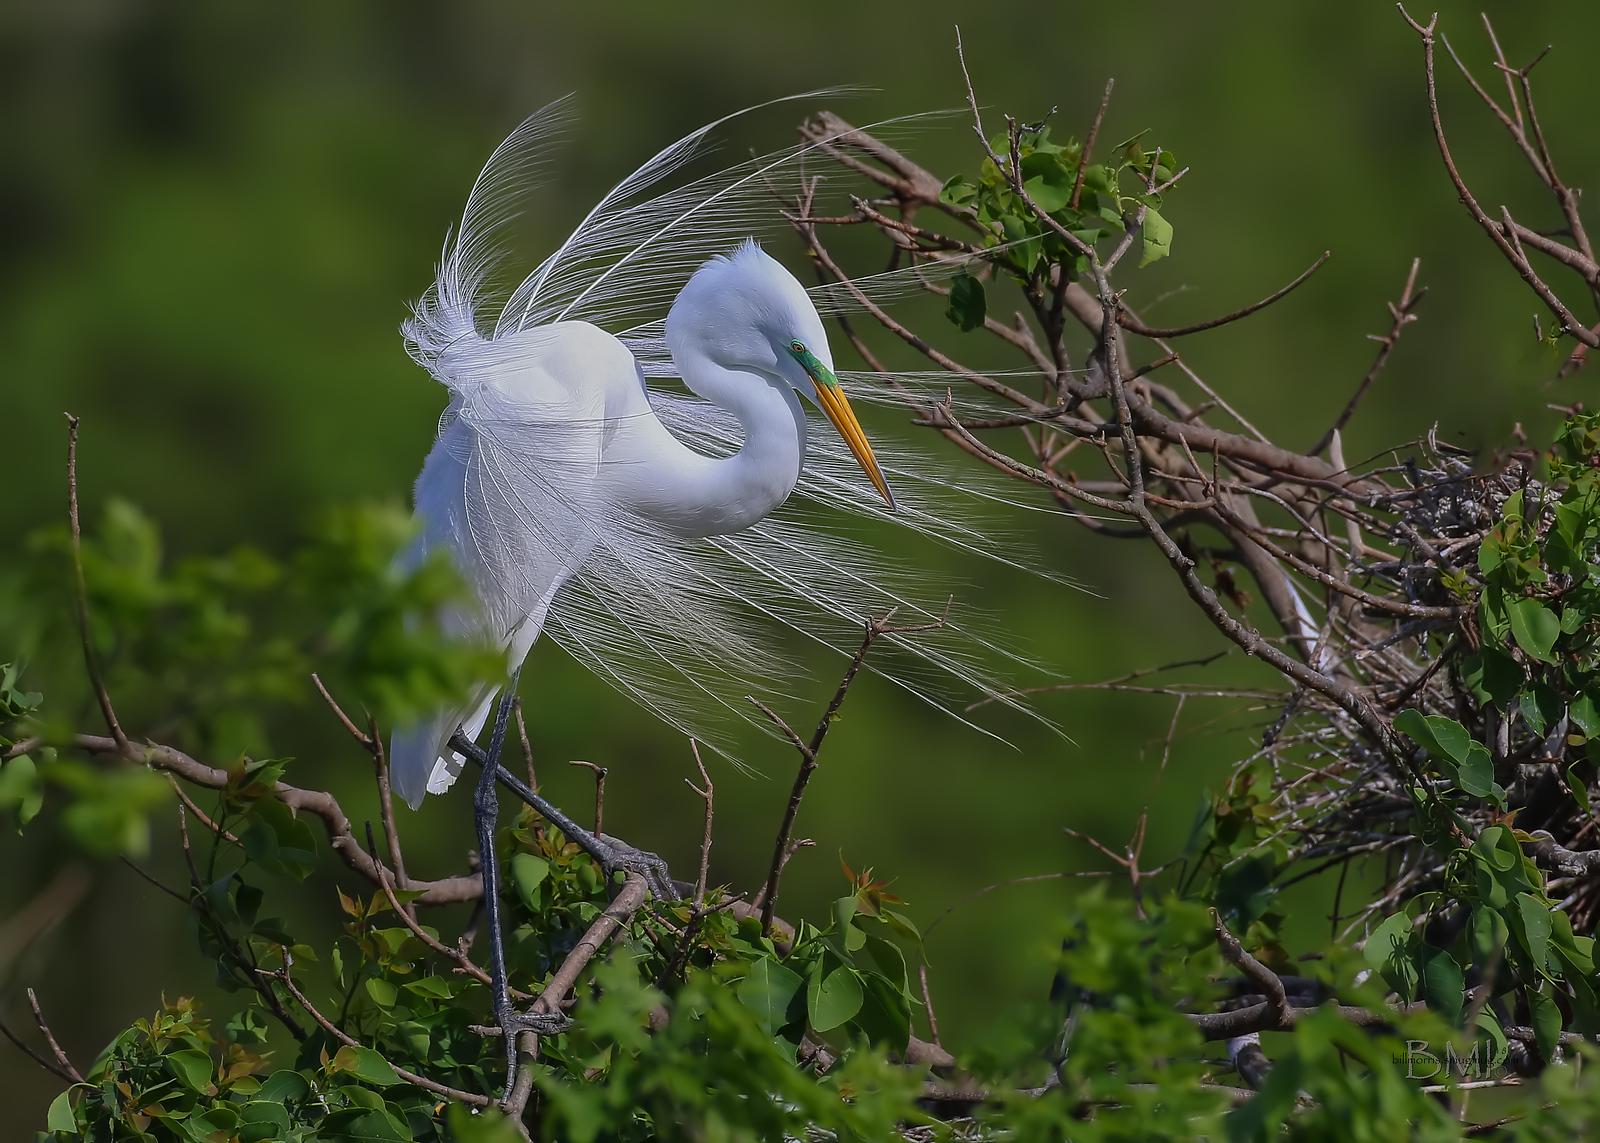 IMAGE: https://photos.smugmug.com/Beautyinthetreesandintheair/Herons-egrets-and-other-large-wading-birds/i-DQmqwXs/2/bdd0af01/X3/Great%20egret%203-30-18-42-X3.jpg